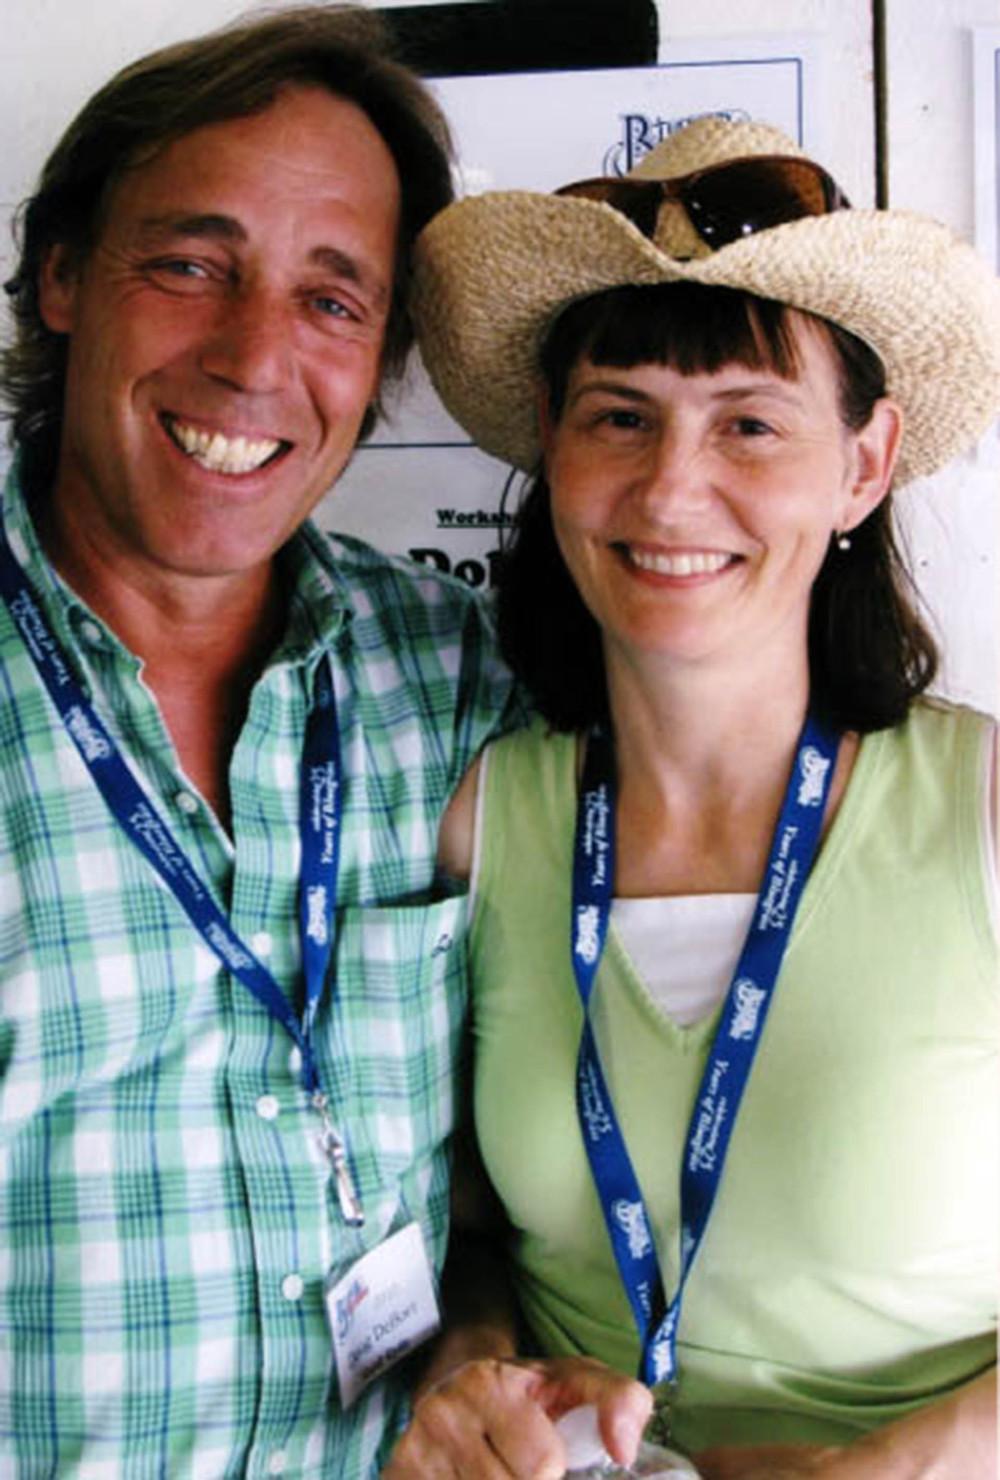 2010 - Doug DeBoer of Hard Ryde with Blueberry treasurer Sheila Hallett